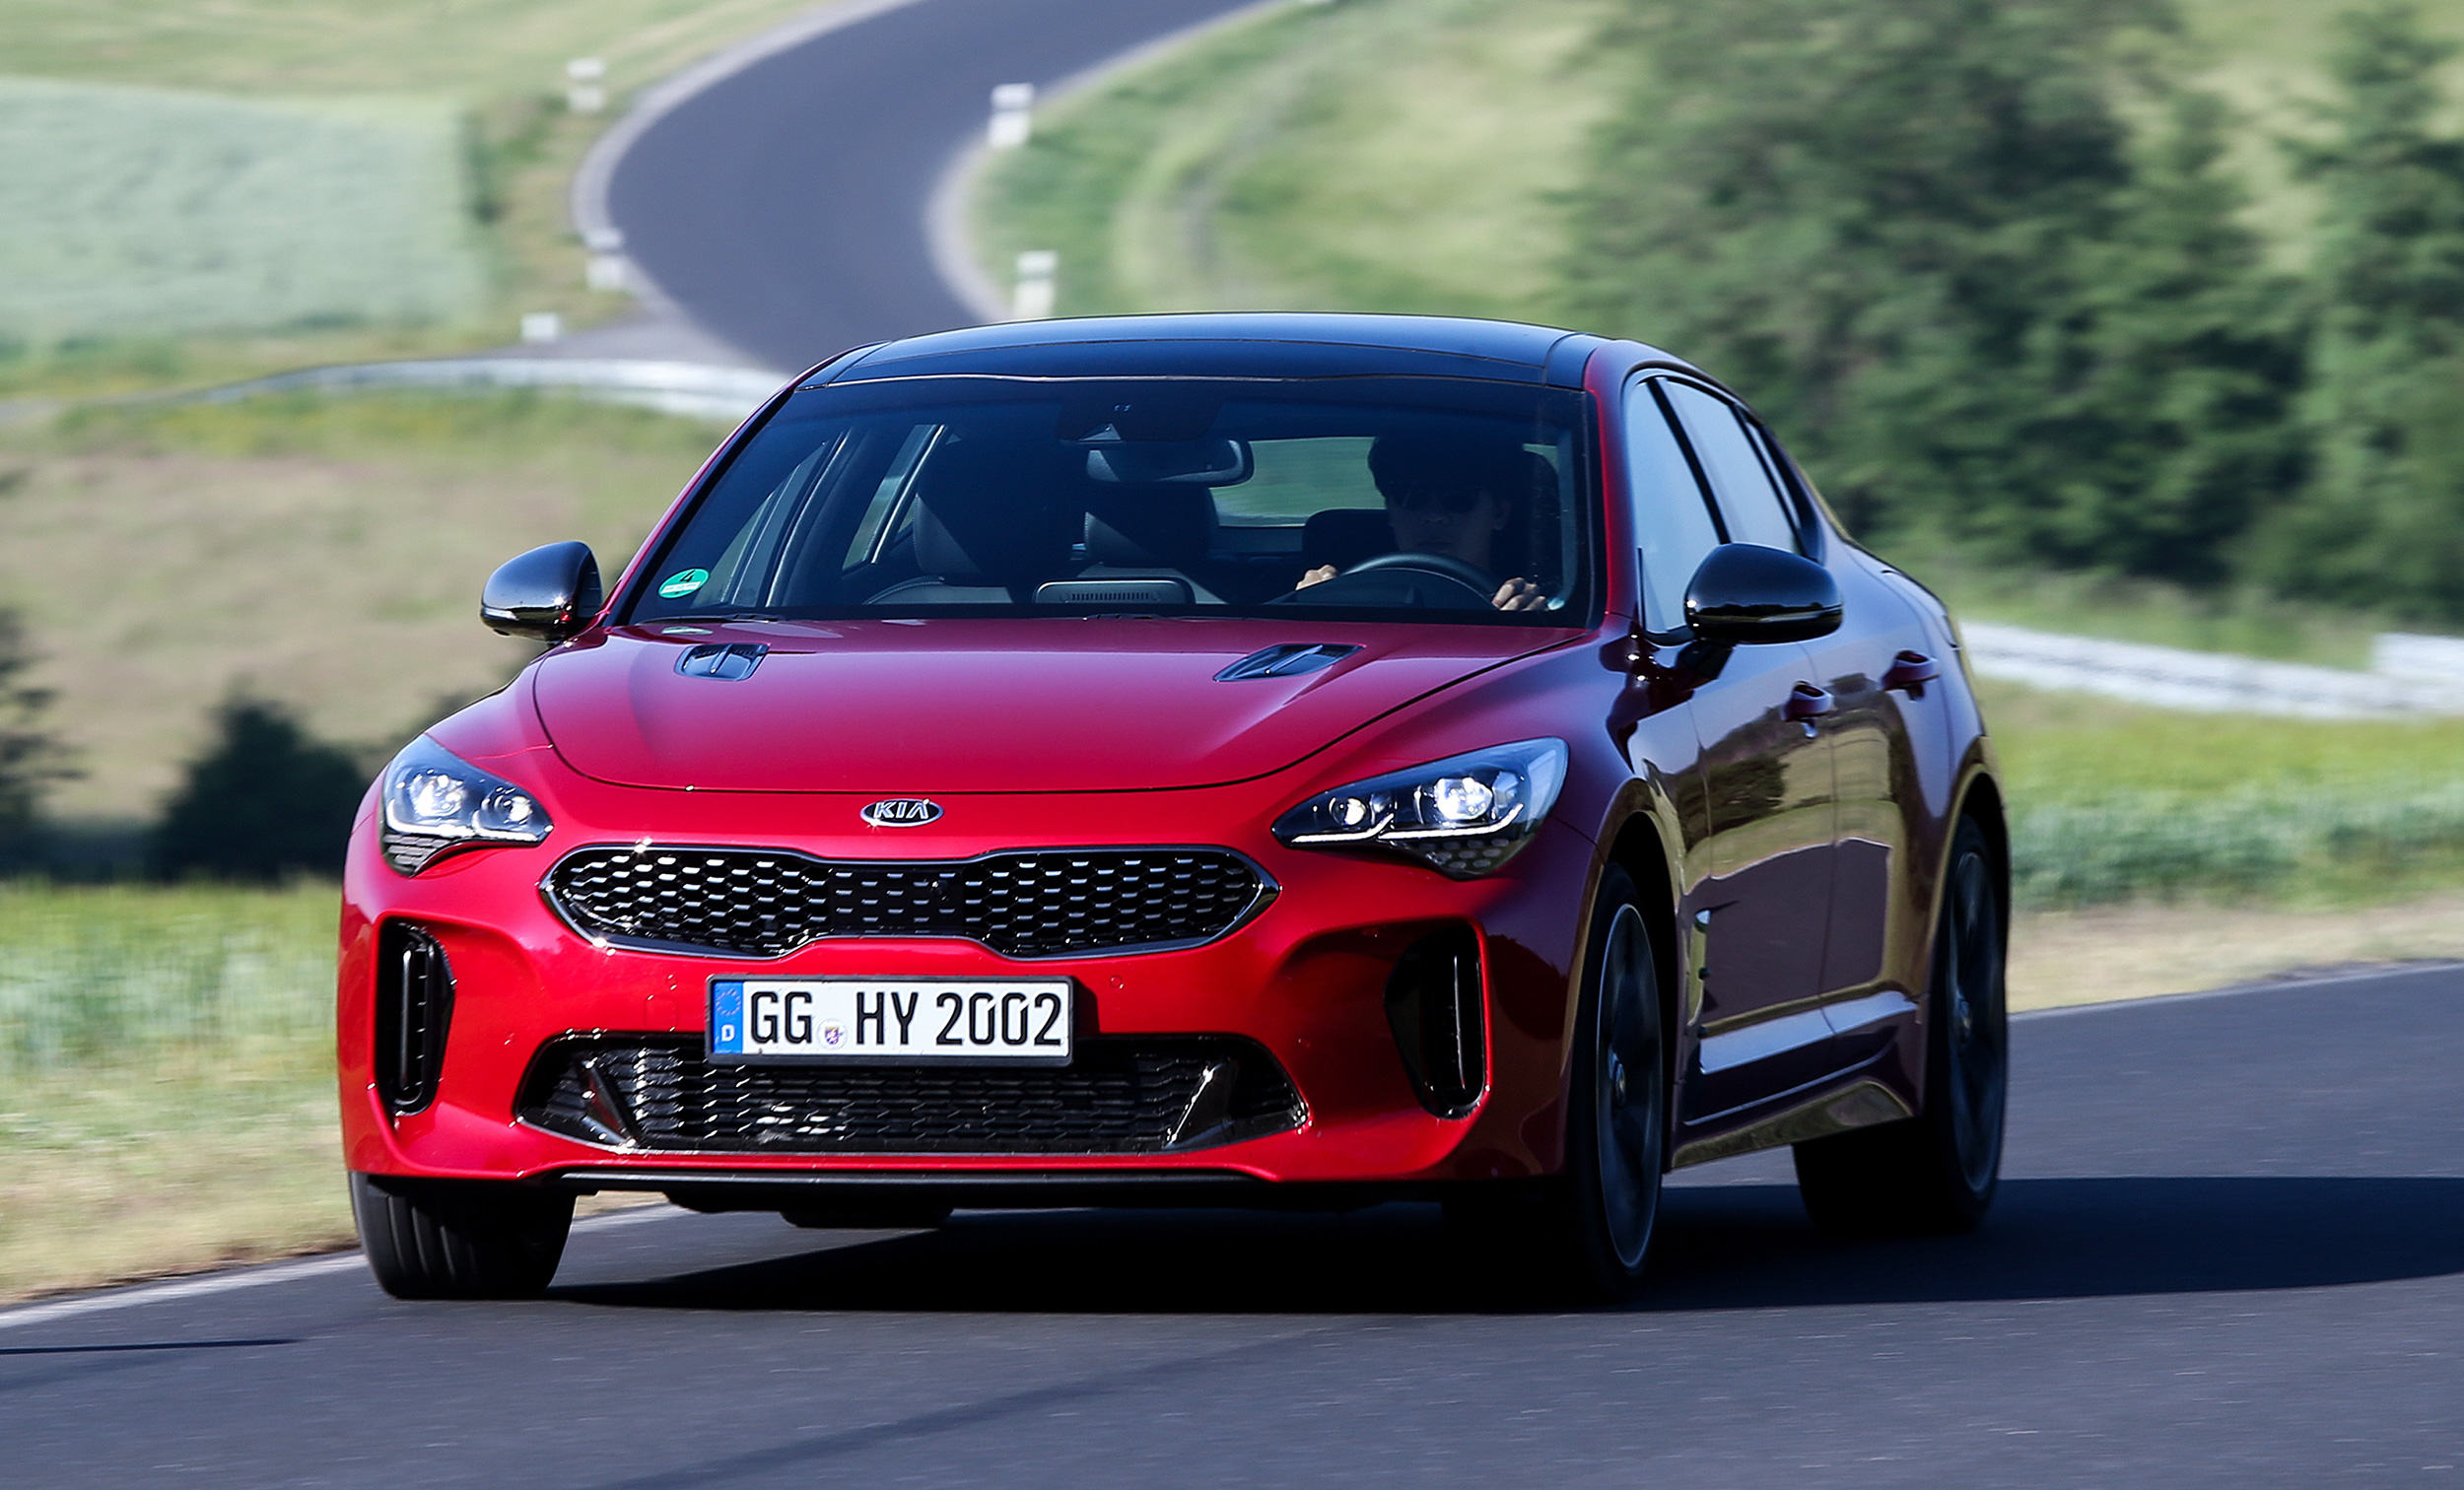 Kia Stinger GT - Autovisie.nl